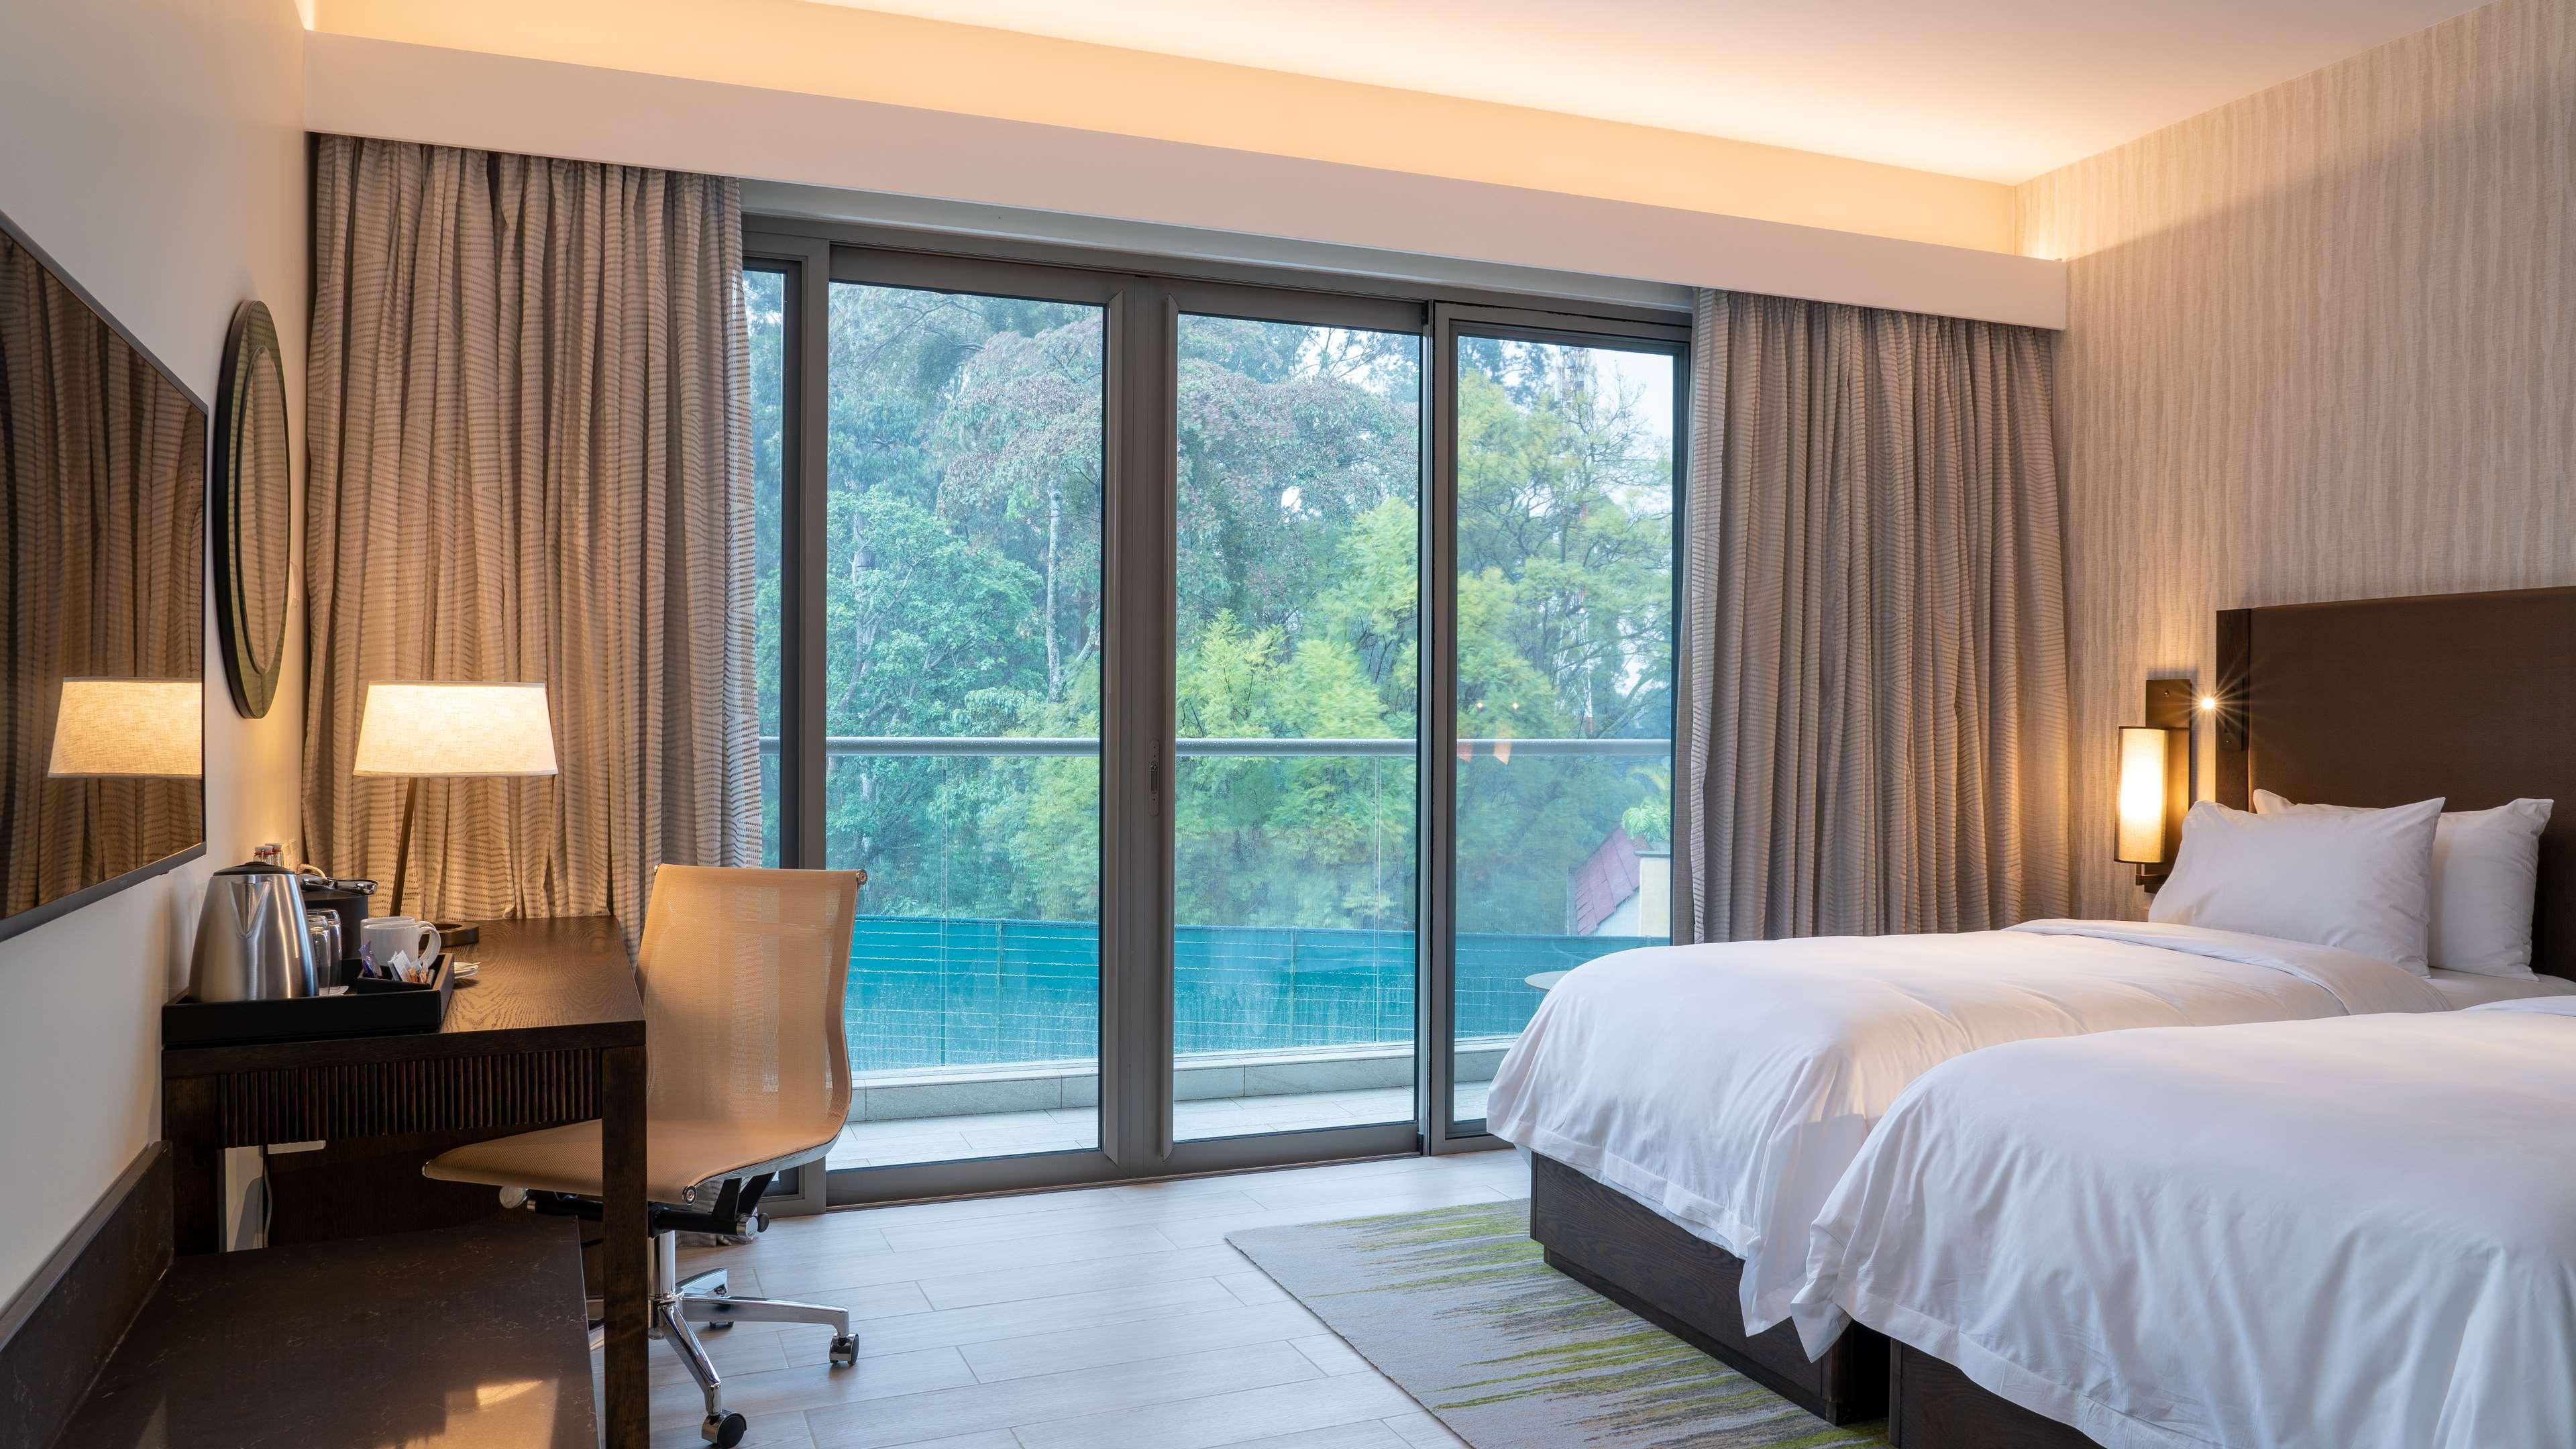 Radisson Blu Hotel & Residence, Nairobi Arboretum